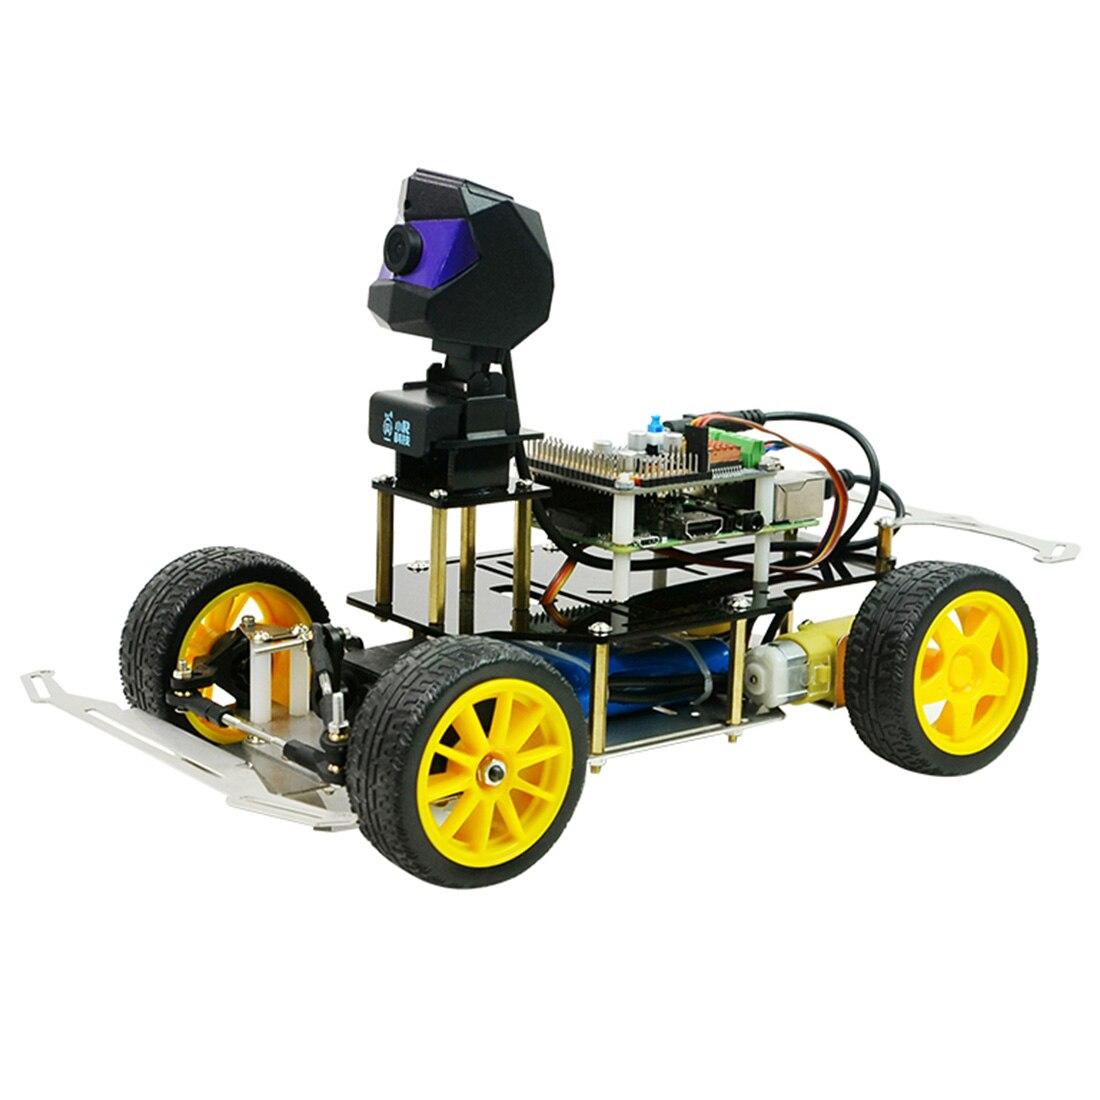 Donkey Car Smart AI Line Follower Robot Opensource DIY Self Driving Platform For Raspberry Pi RC Car Programmable Toys Kids Gift